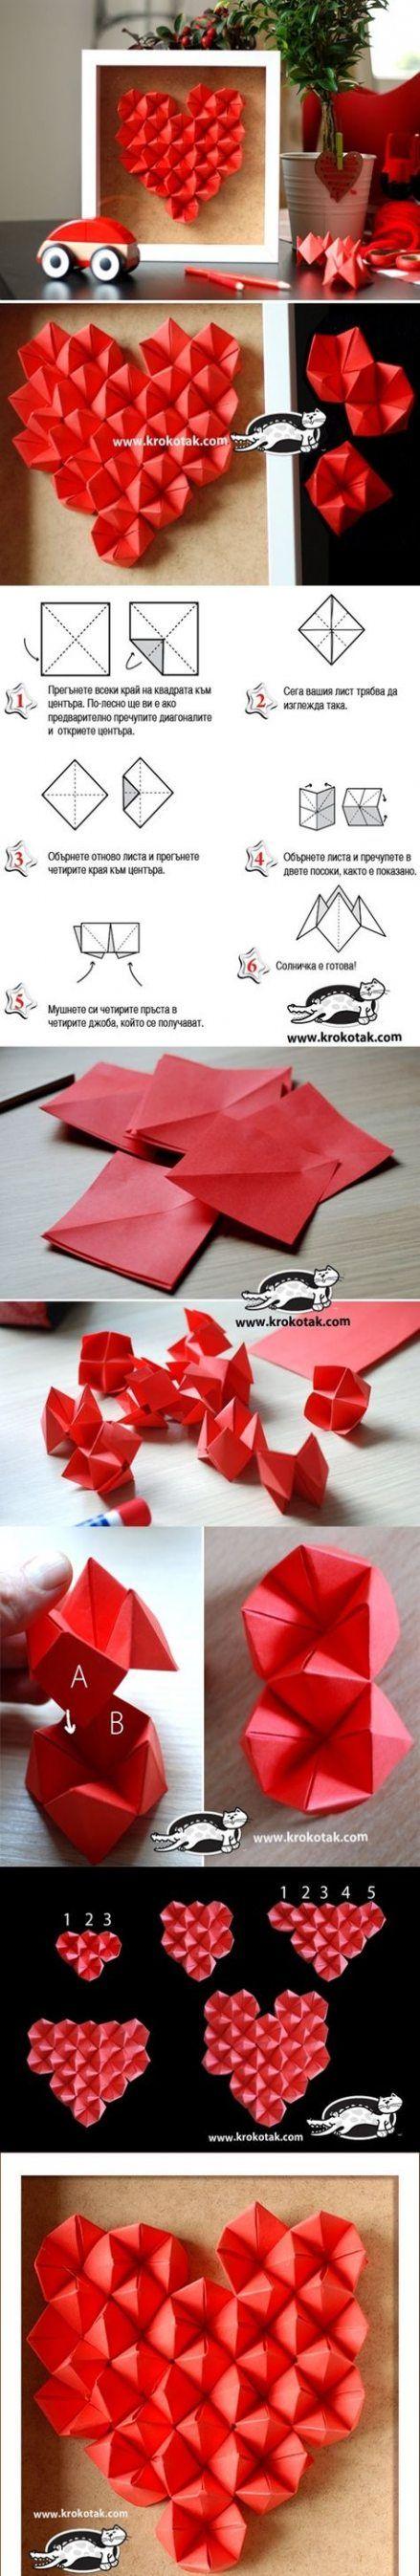 62+ Ideas Origami Modular Ball Paper Flowers #flowers #origami